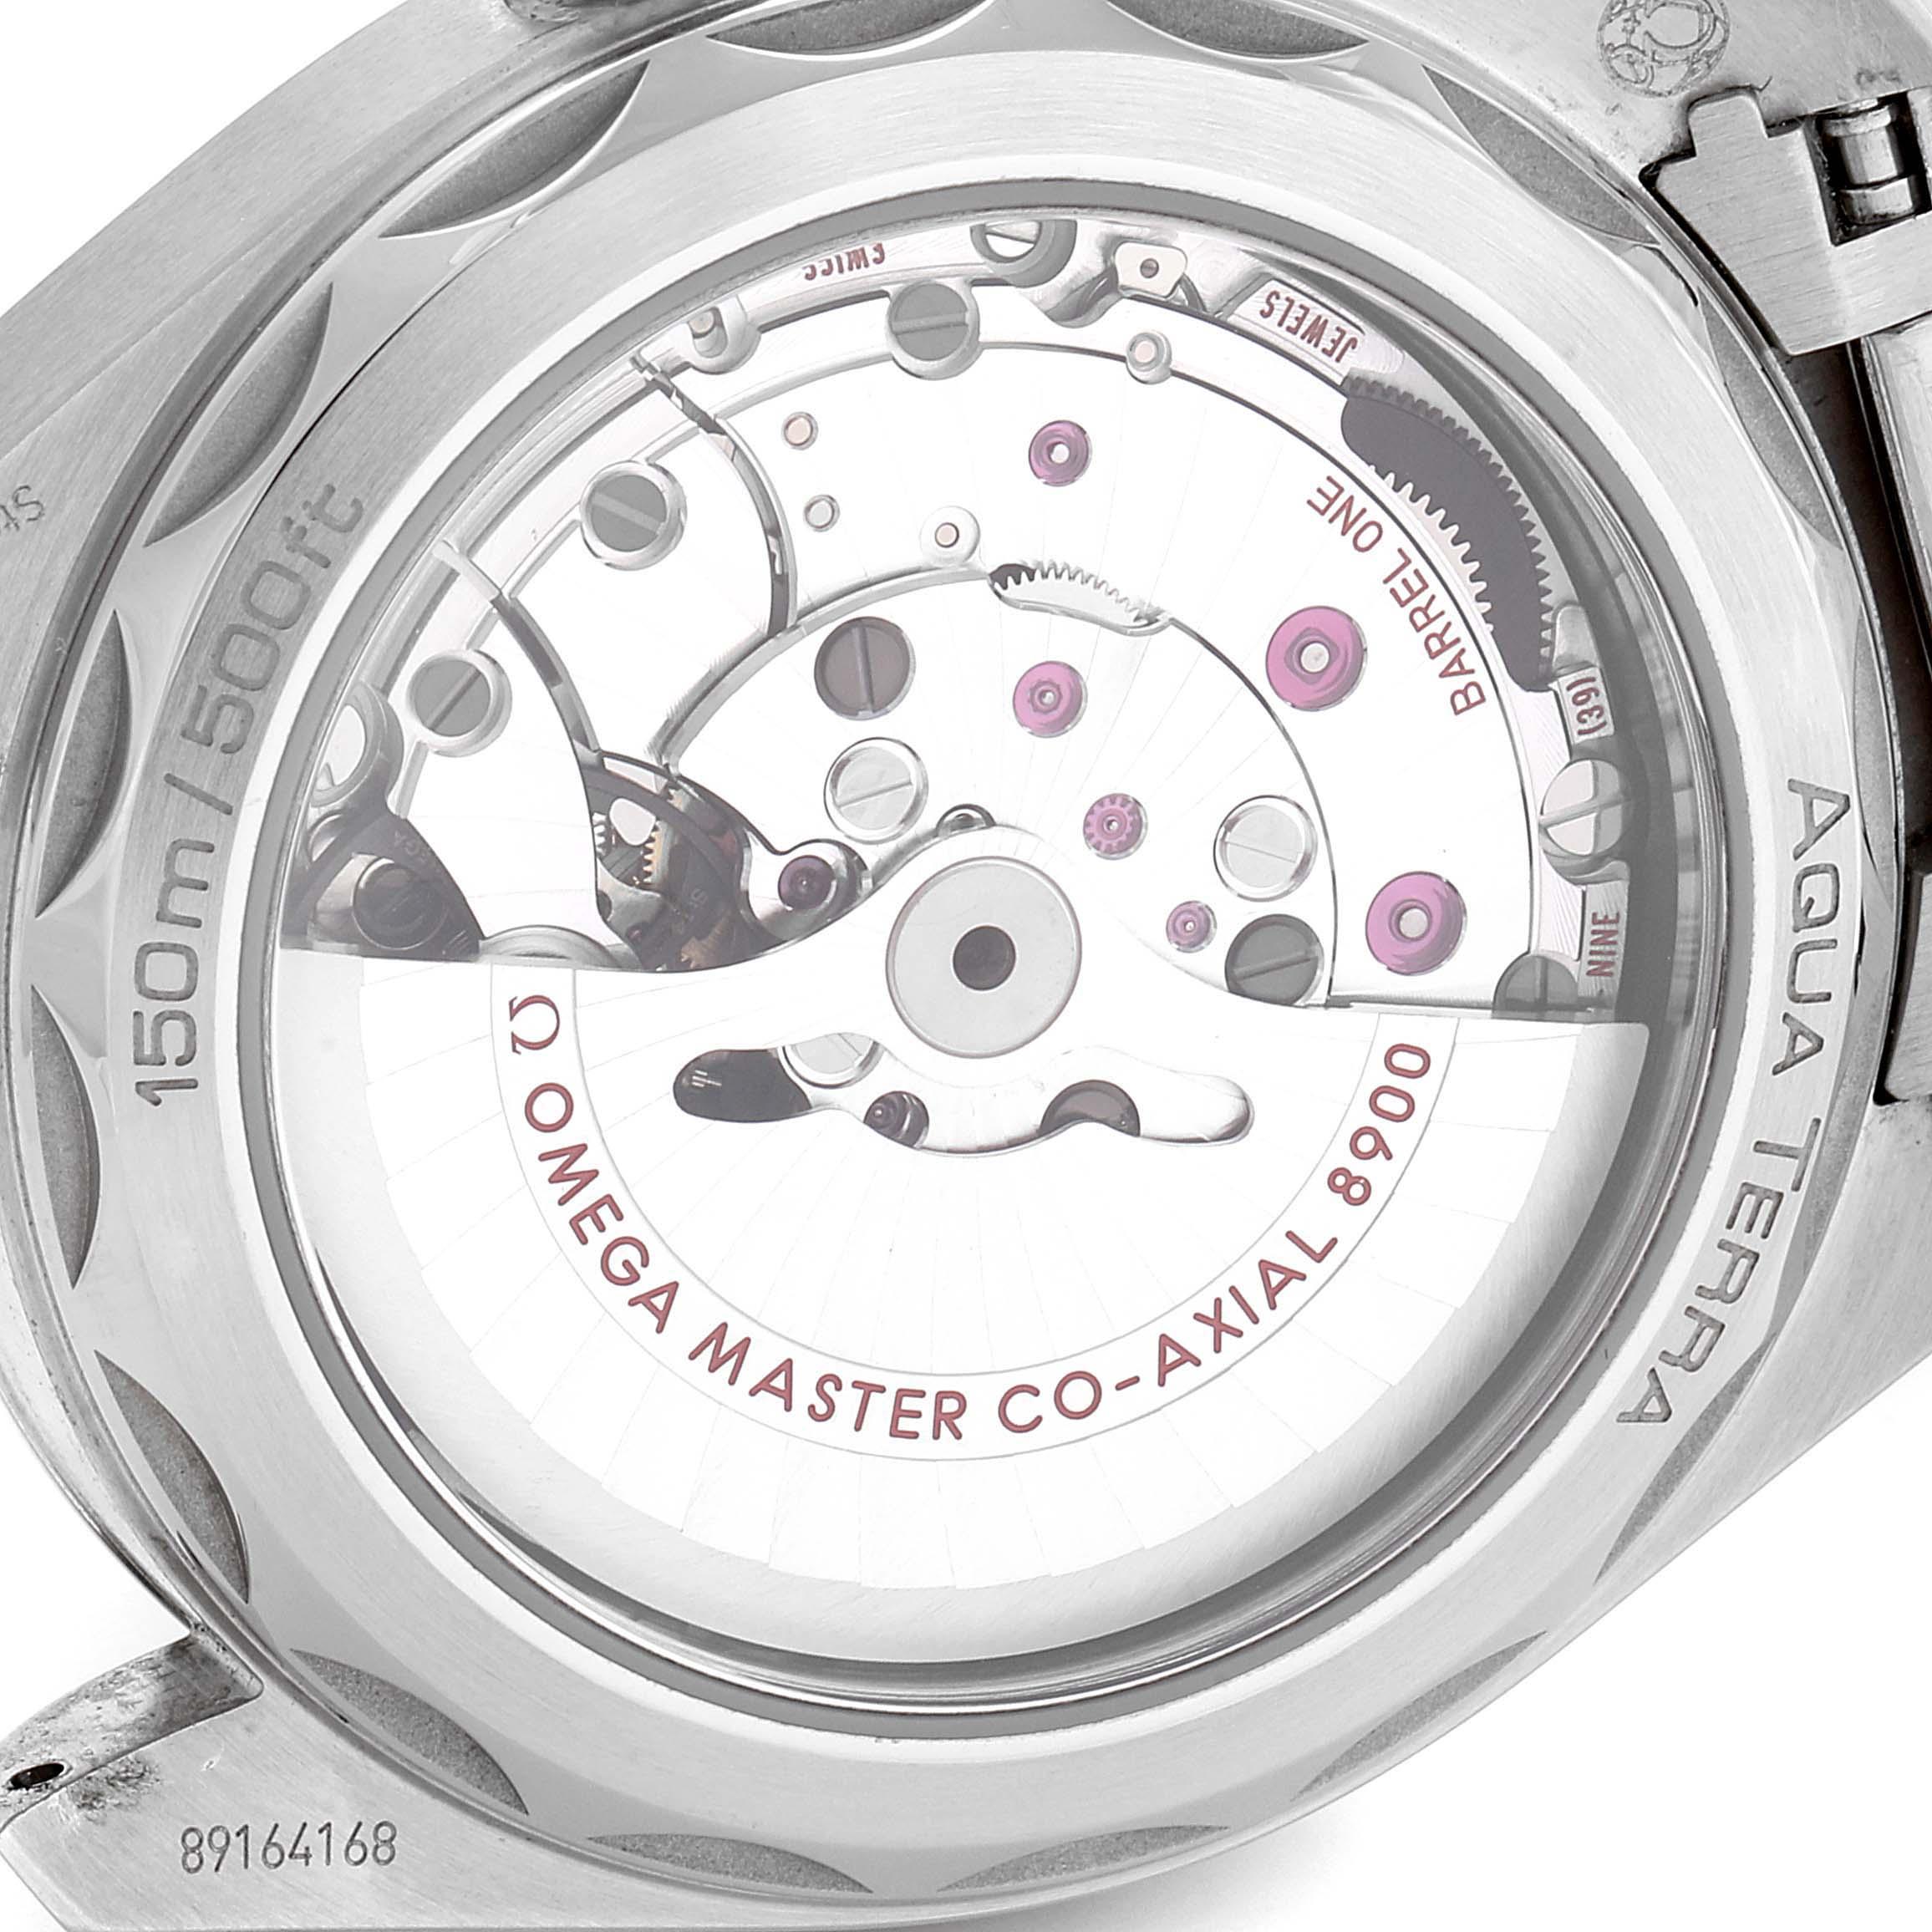 Omega Seamaster Aqua Terra Blue Dial Watch 220.10.41.21.03.001 Box Card SwissWatchExpo